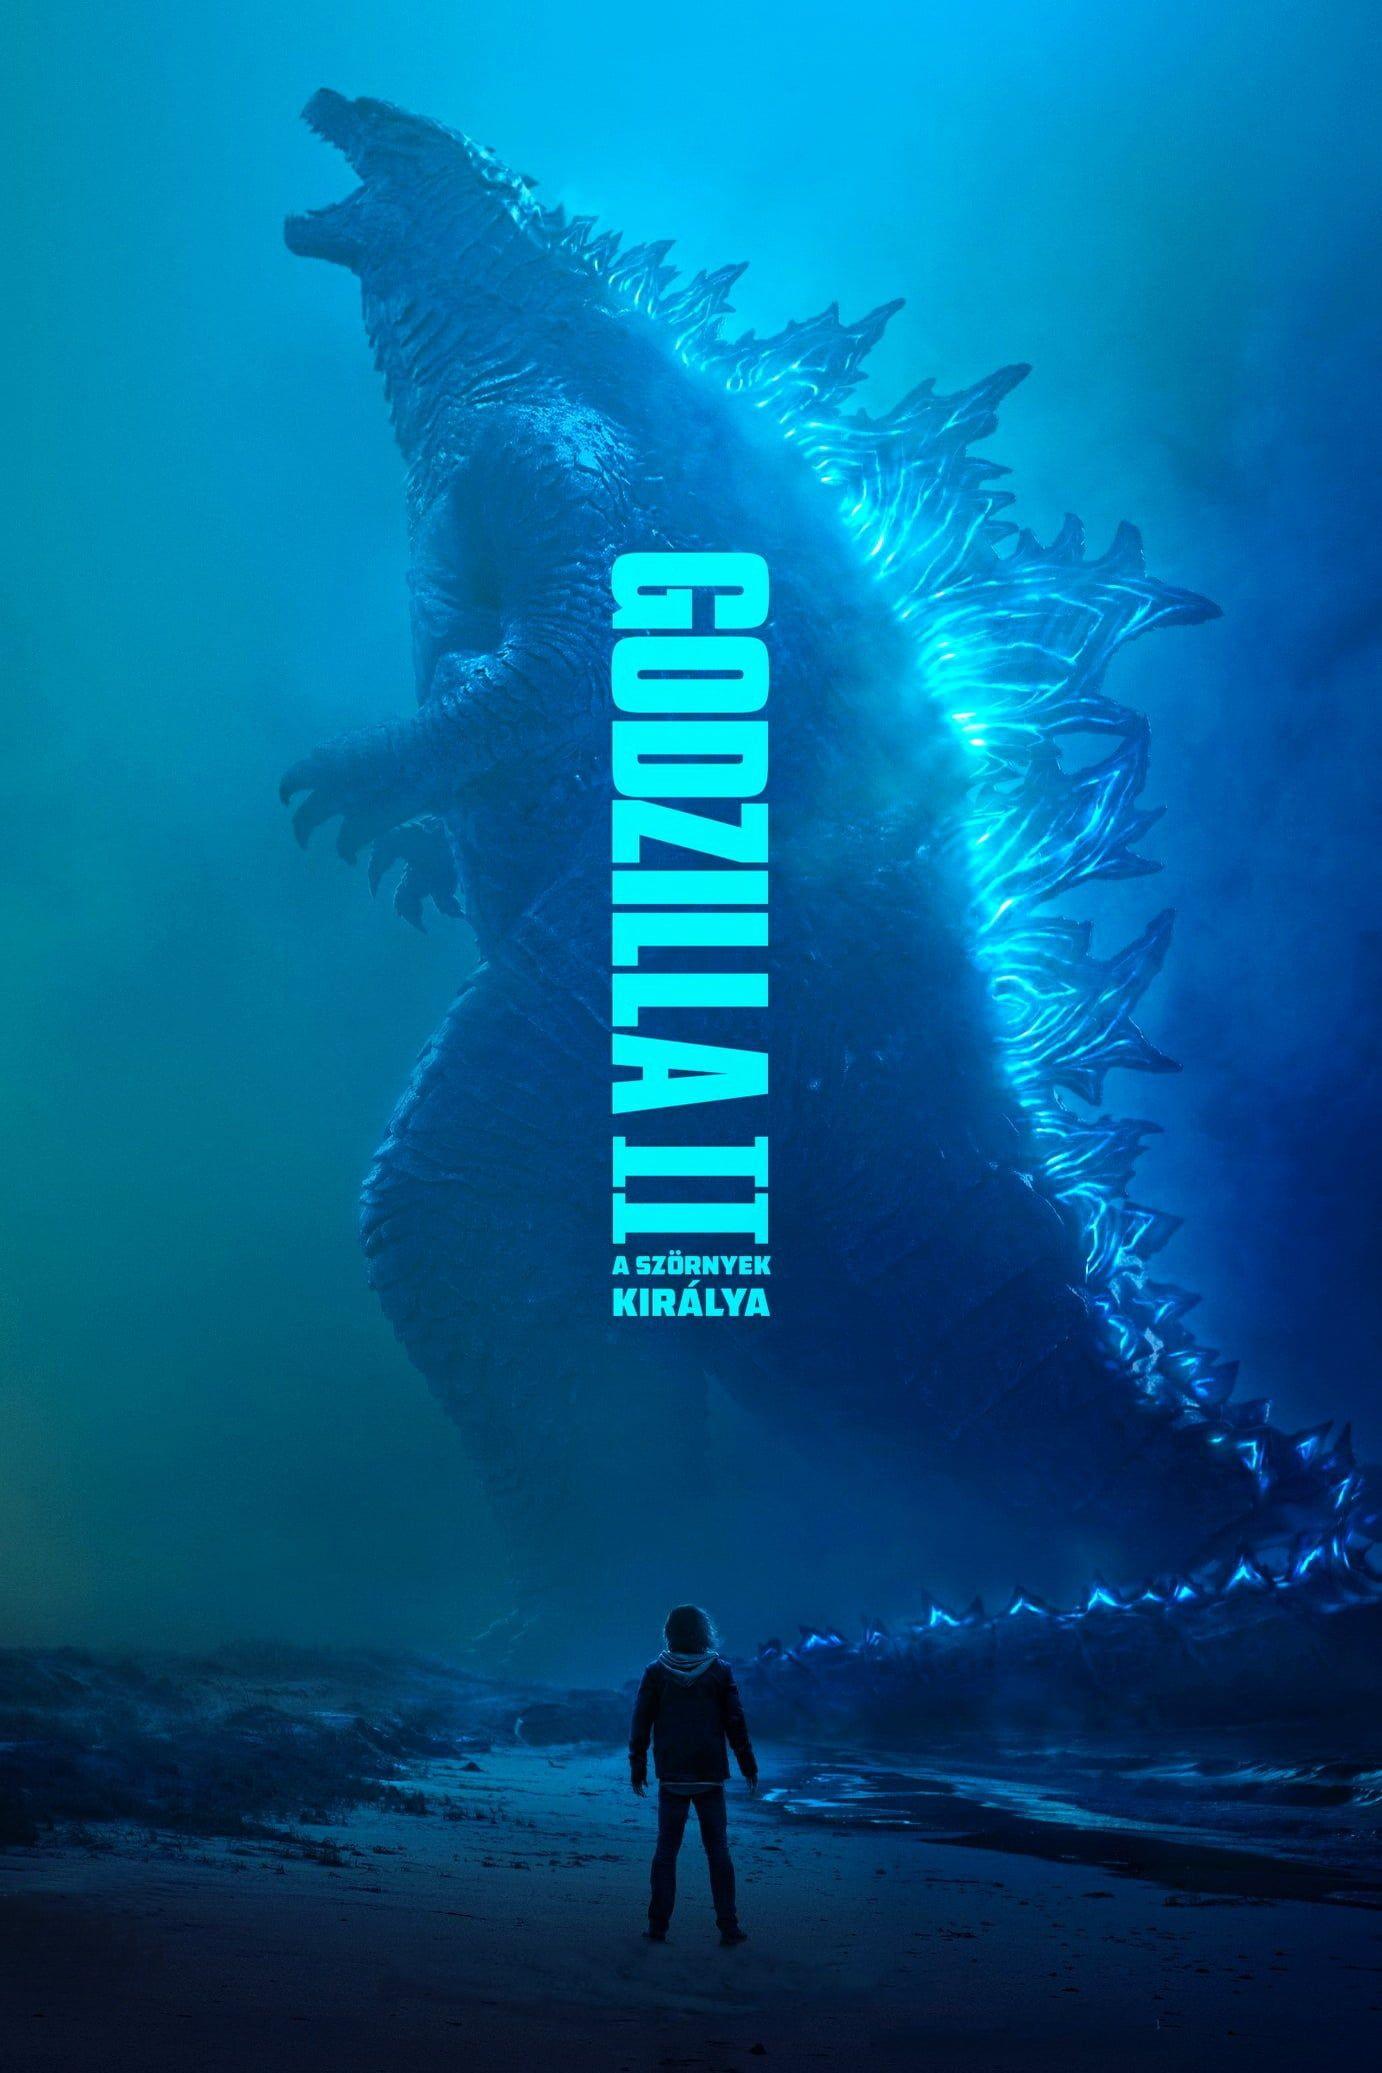 Videa Online Godzilla A Szornyek Kiralya 2019 Teljes Film Magyarul Movie Monsters Godzilla Free Movies Online